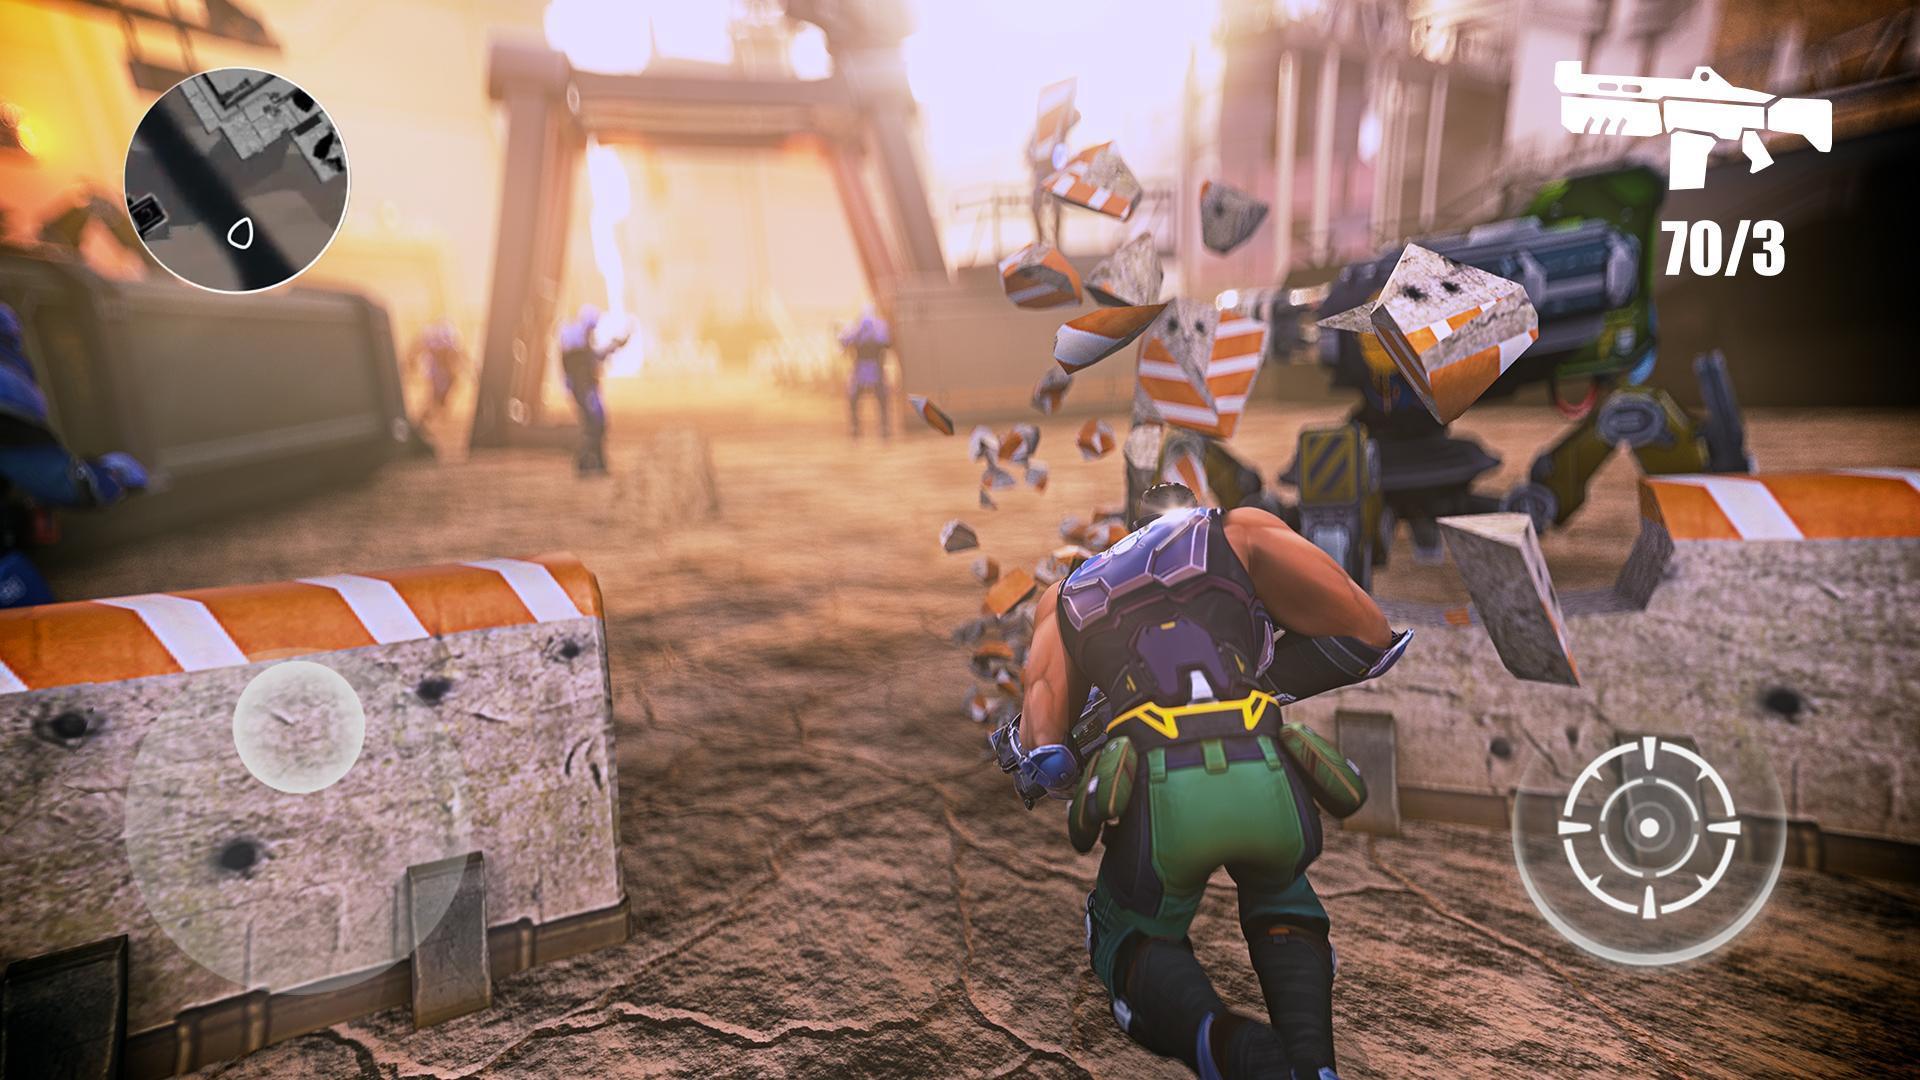 Evolution 2 Battle for Utopia. Action games 0.580.78866 Screenshot 10